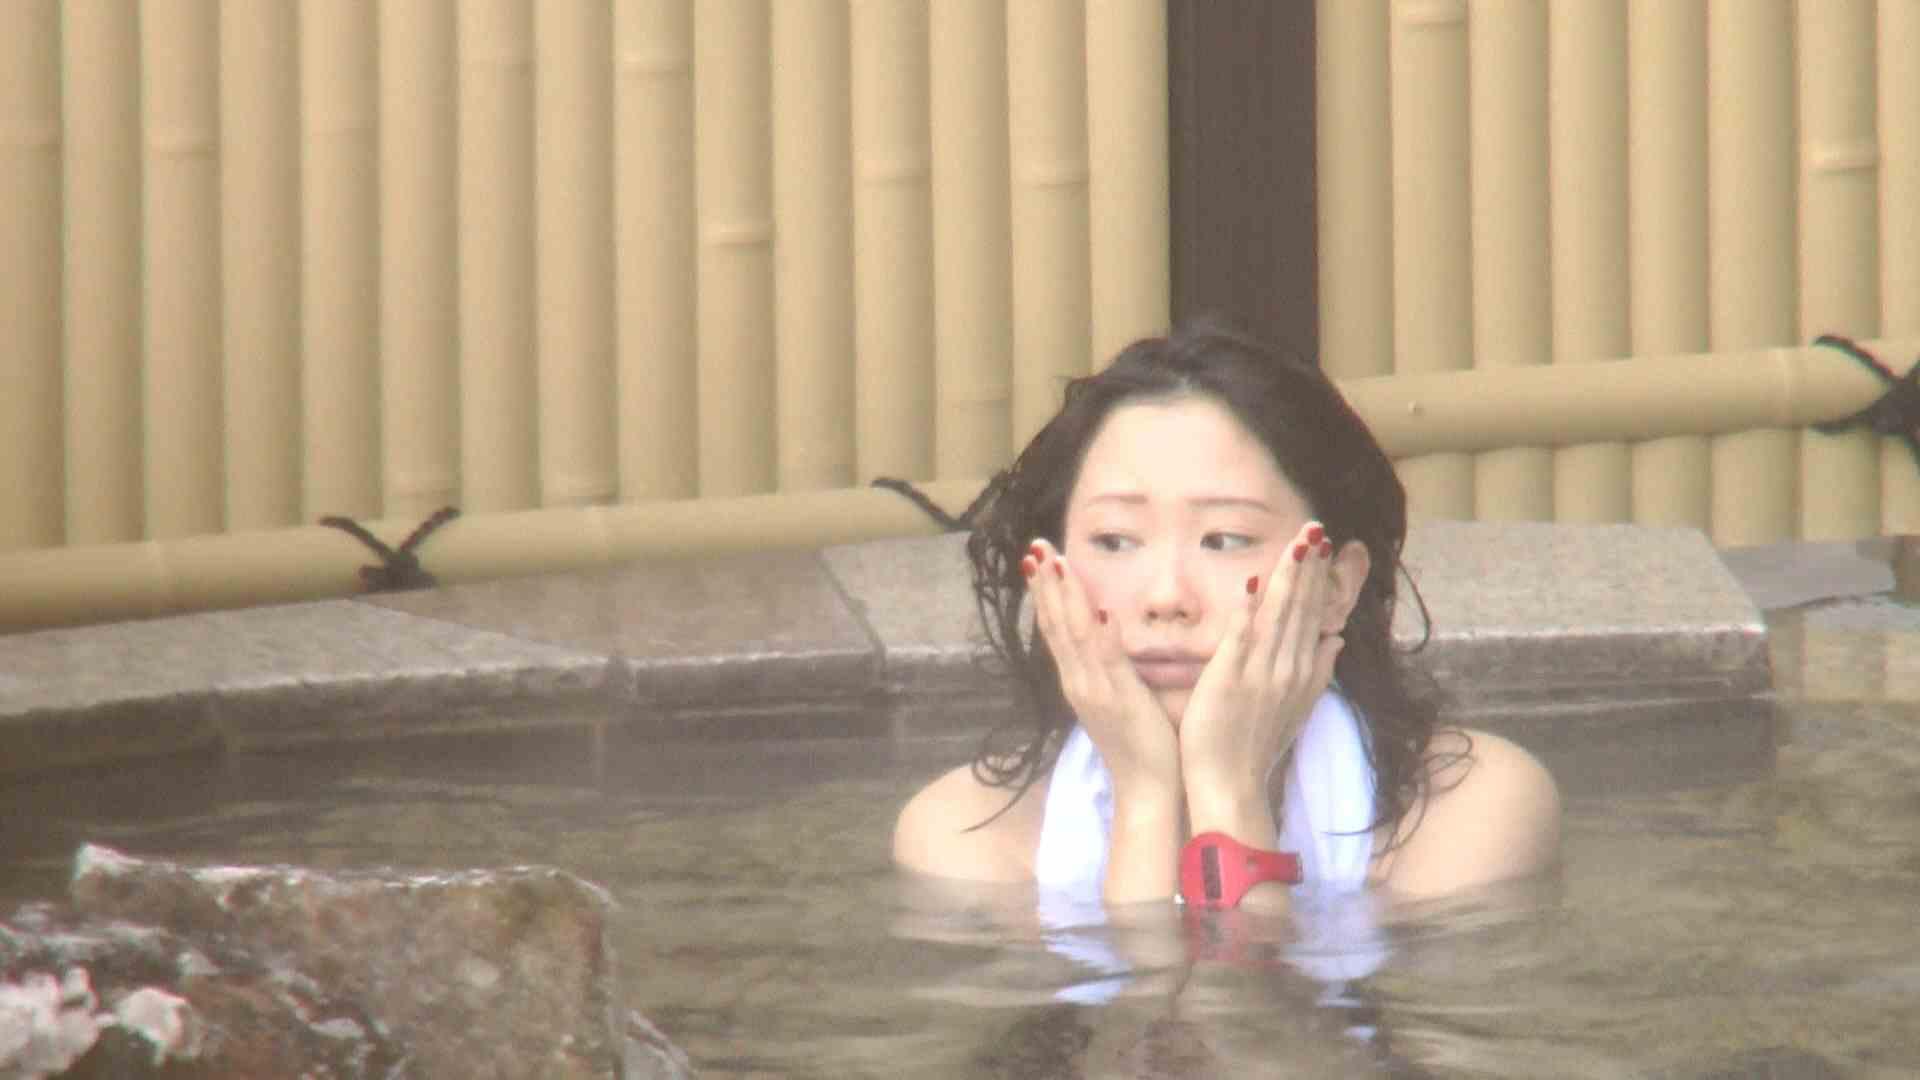 Aquaな露天風呂Vol.211 盗撮シリーズ   露天風呂編  76PIX 1